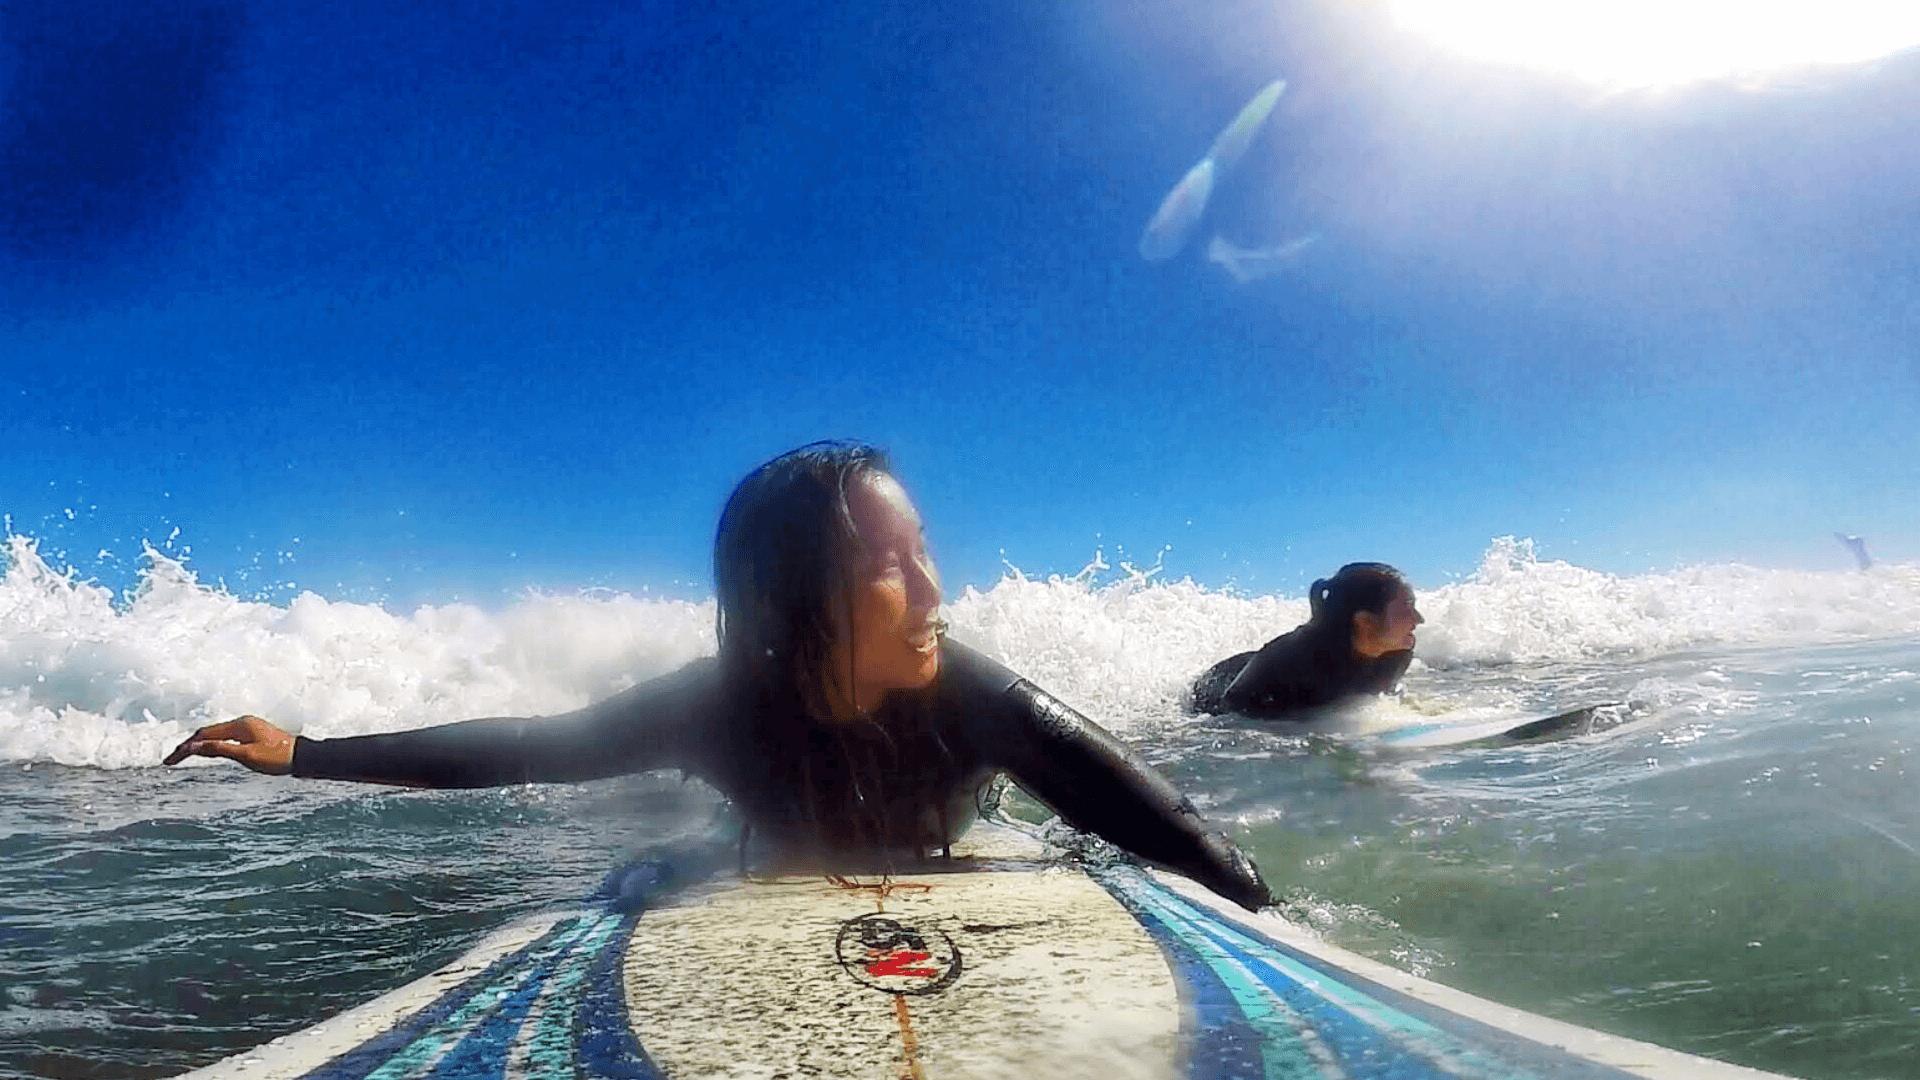 Mat_Amanda_amanda in the water surfing gopro shot